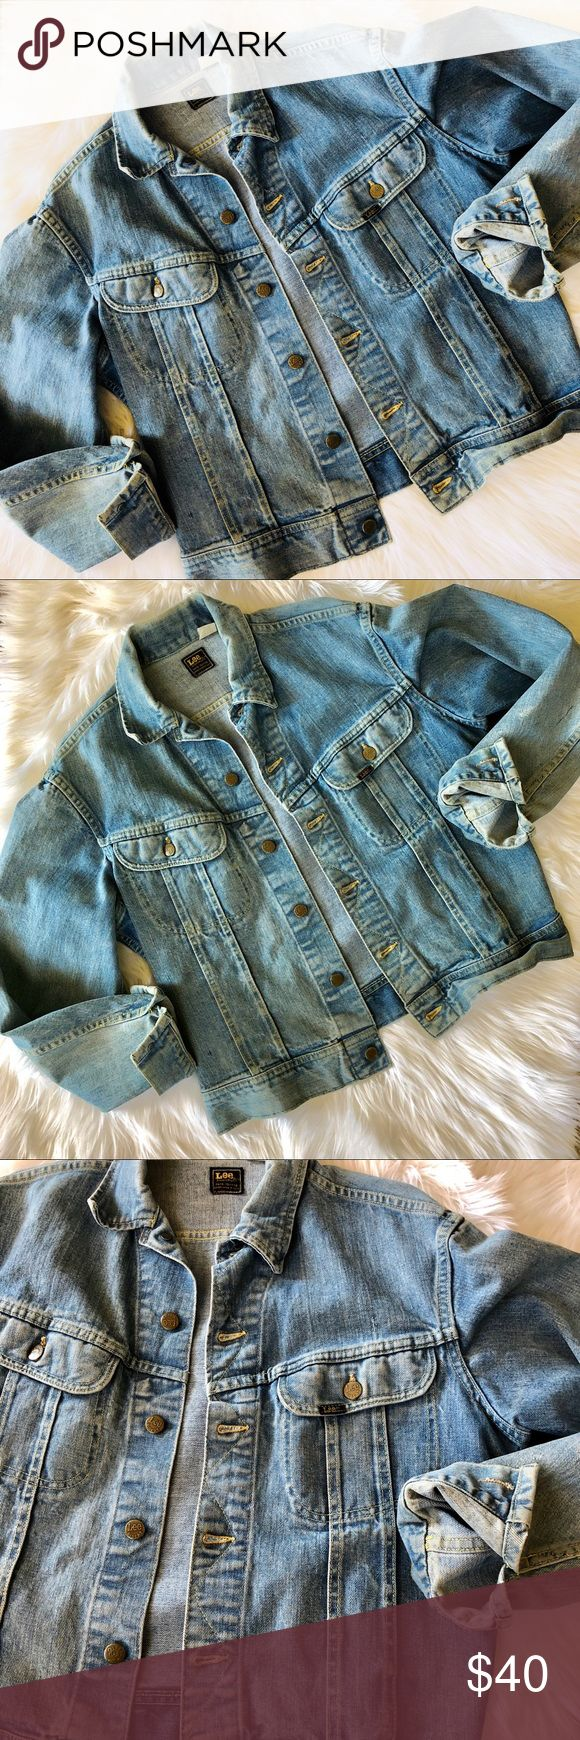 Lee Riders Vintage Retro Denim Jacket Lee Riders Vintage Retro Denim Jacket Fits a Men S/M Or Women's Oversized S or M Lee Jackets & Coats